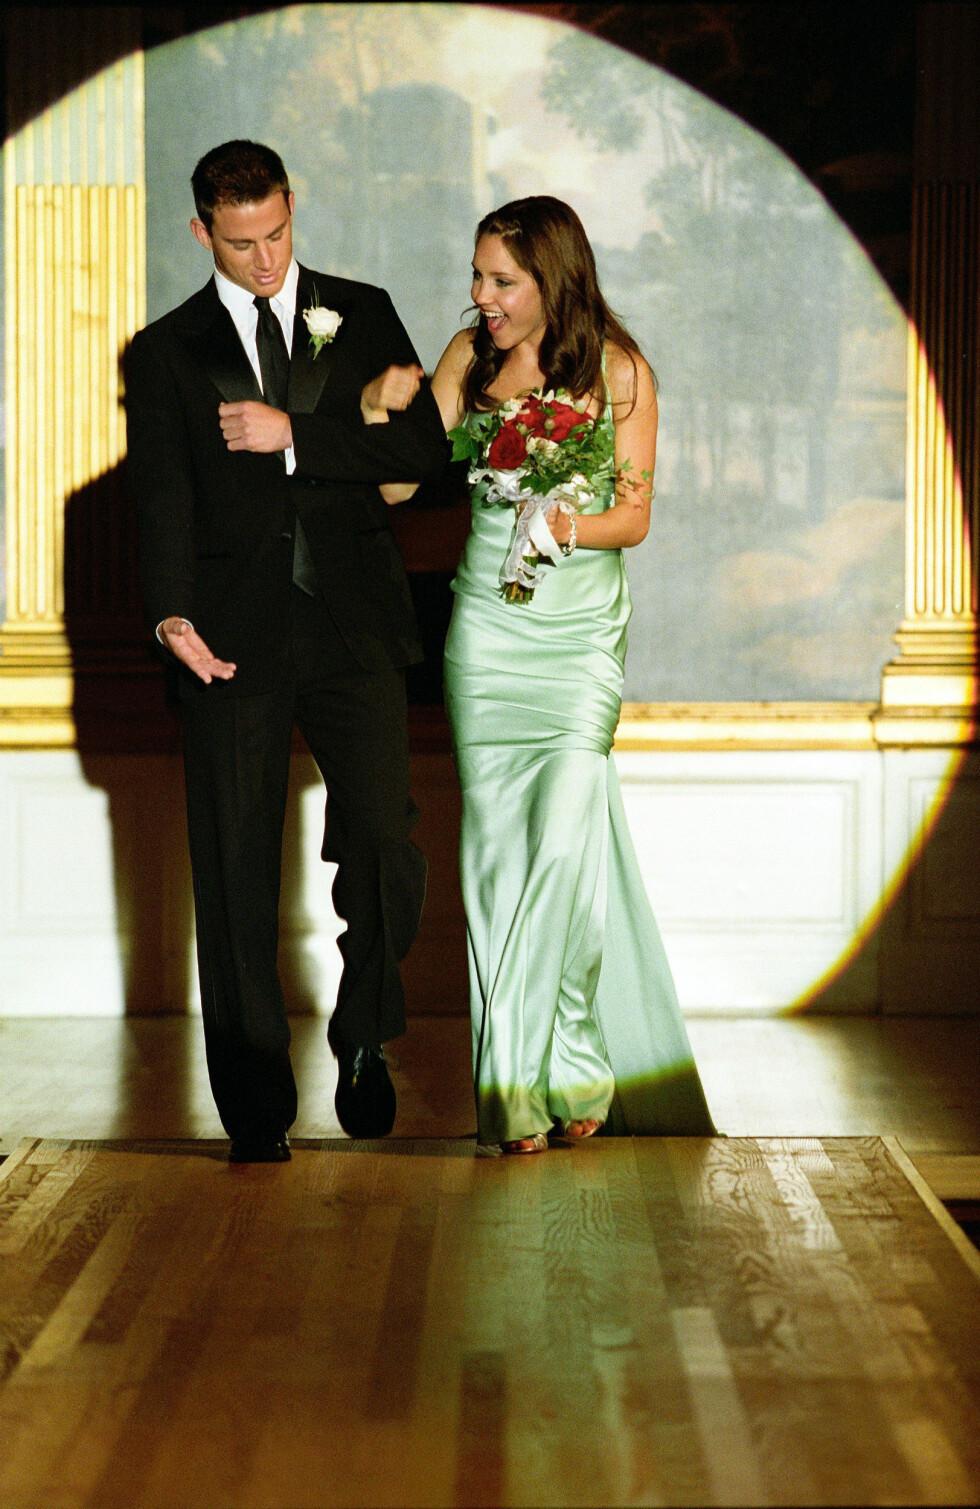 SHE'S THE MAN: Channing Tatum og Amanda Bynes skal ha datet etter at de spilte i samme film. Foto: Scanpix